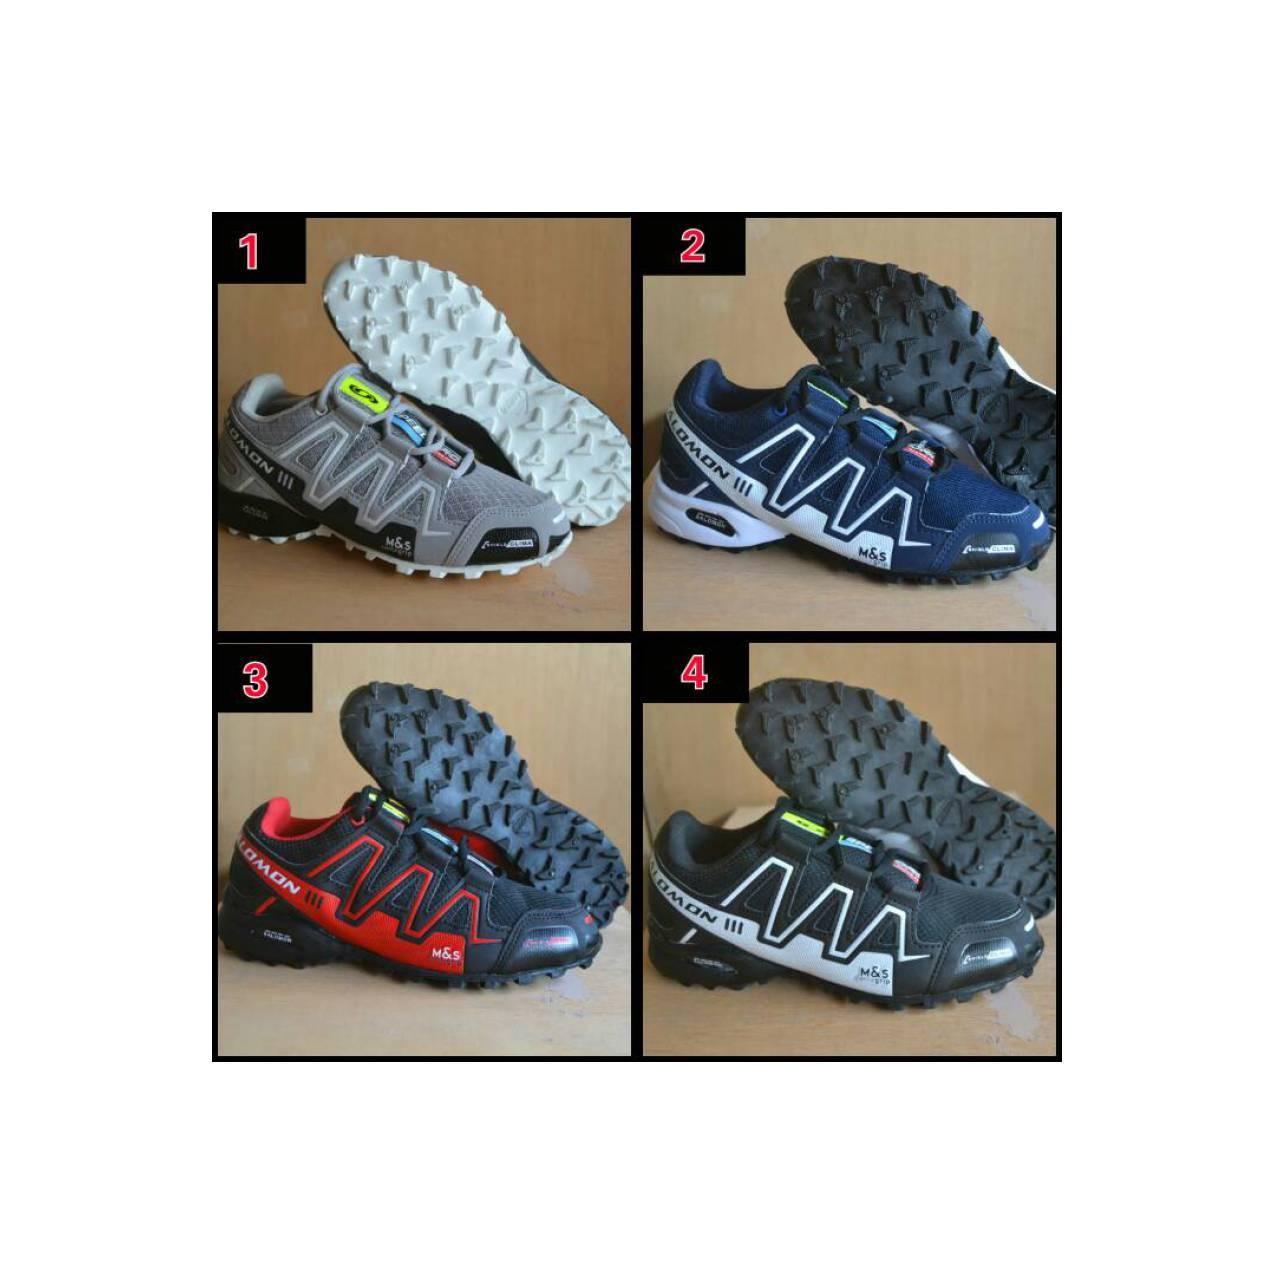 Sepatu Salomon / tracking hiking gunung / KARRIMOR / EIGER / SNTA/ TNF